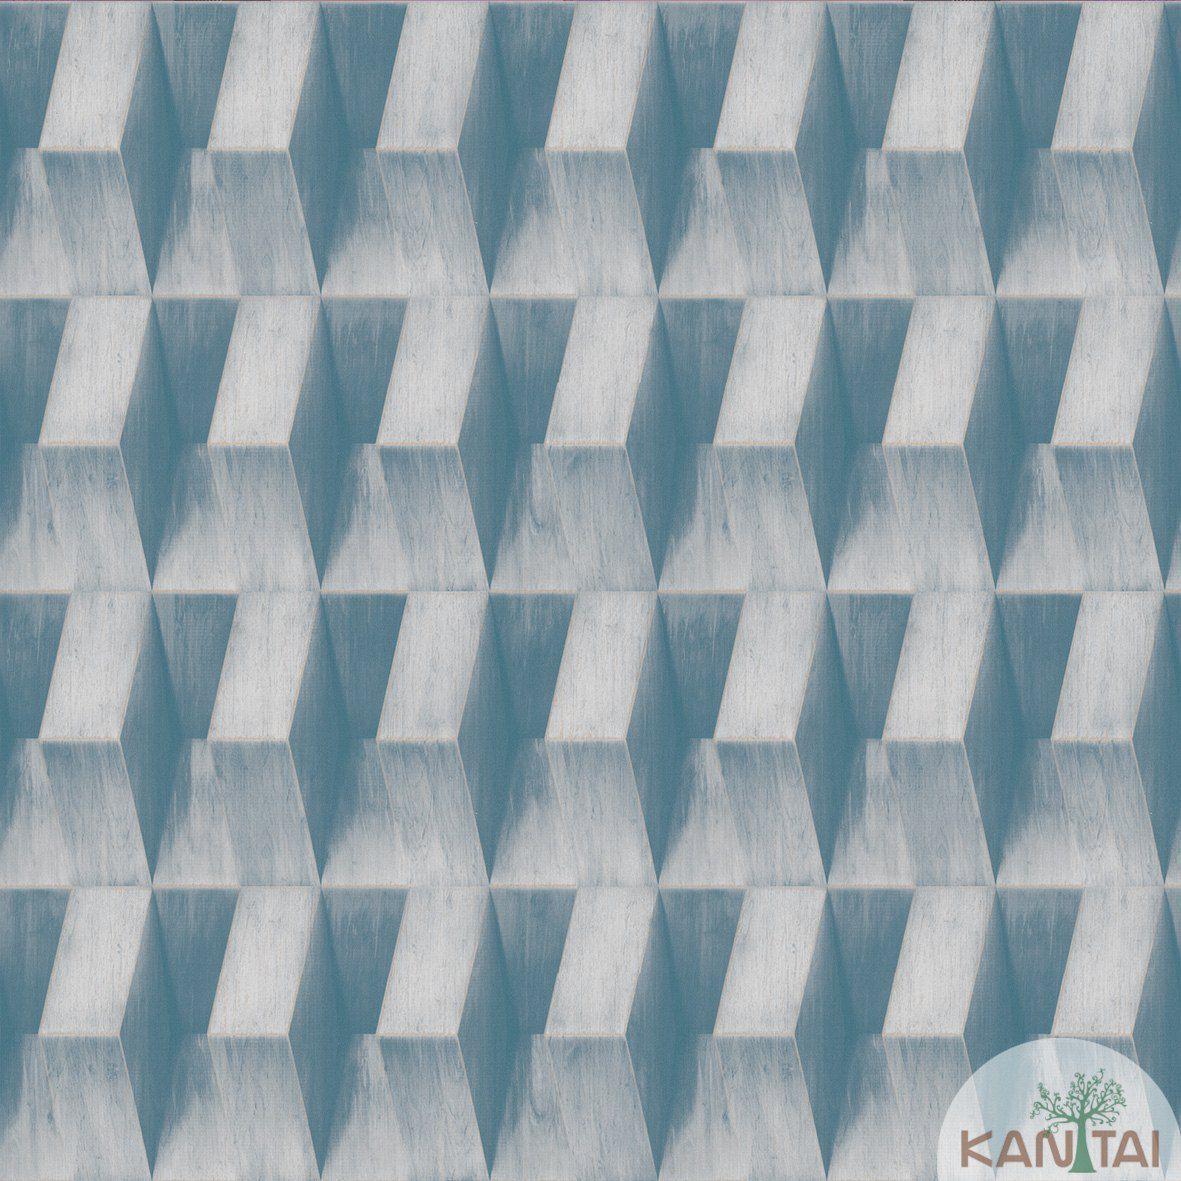 Papel de Parede   Kan Tai  Vinilico Coleção Neonature III 3D Geométrico Tons de Azul, Creme